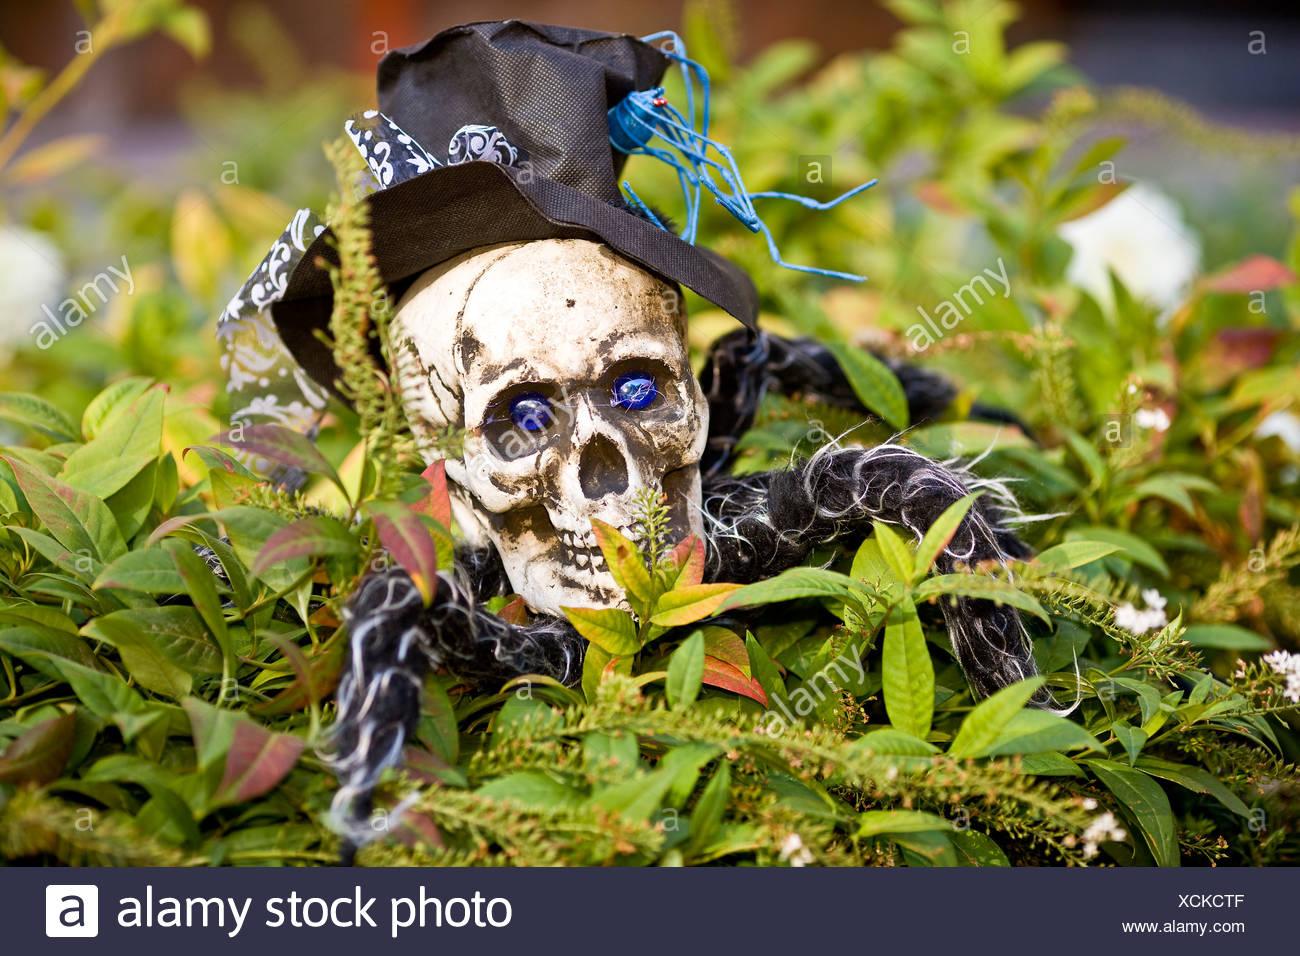 Gigantesco ragno Halloween nel giardino hedge Immagini Stock